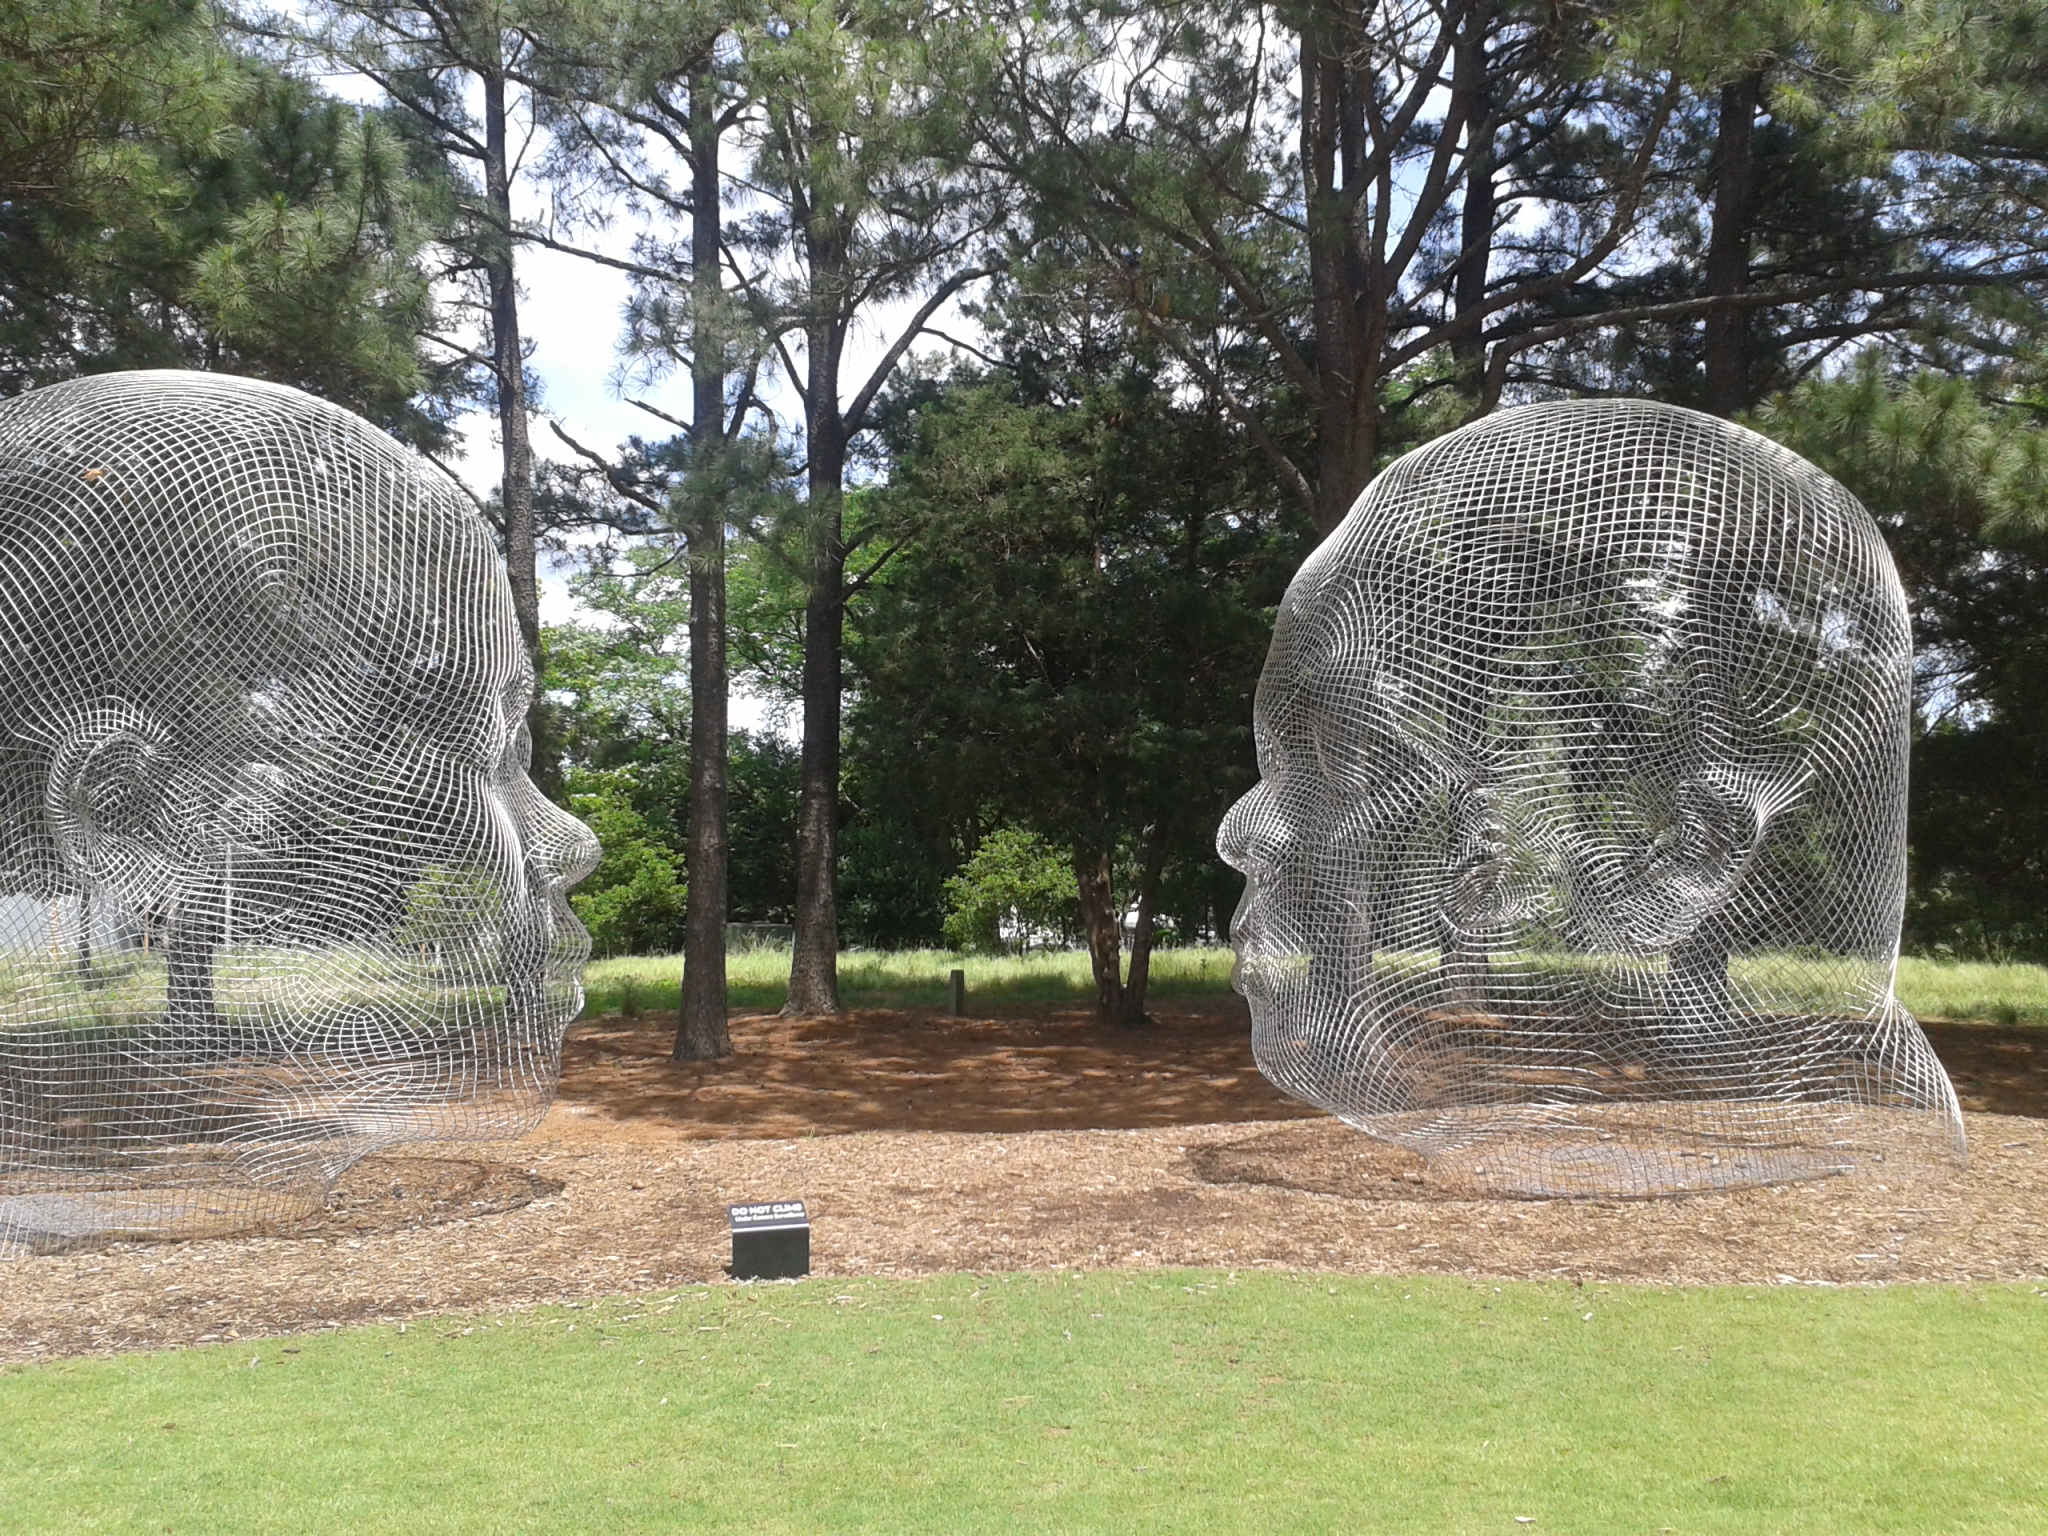 Kunstwerk: Drahtköpfe in einem Park